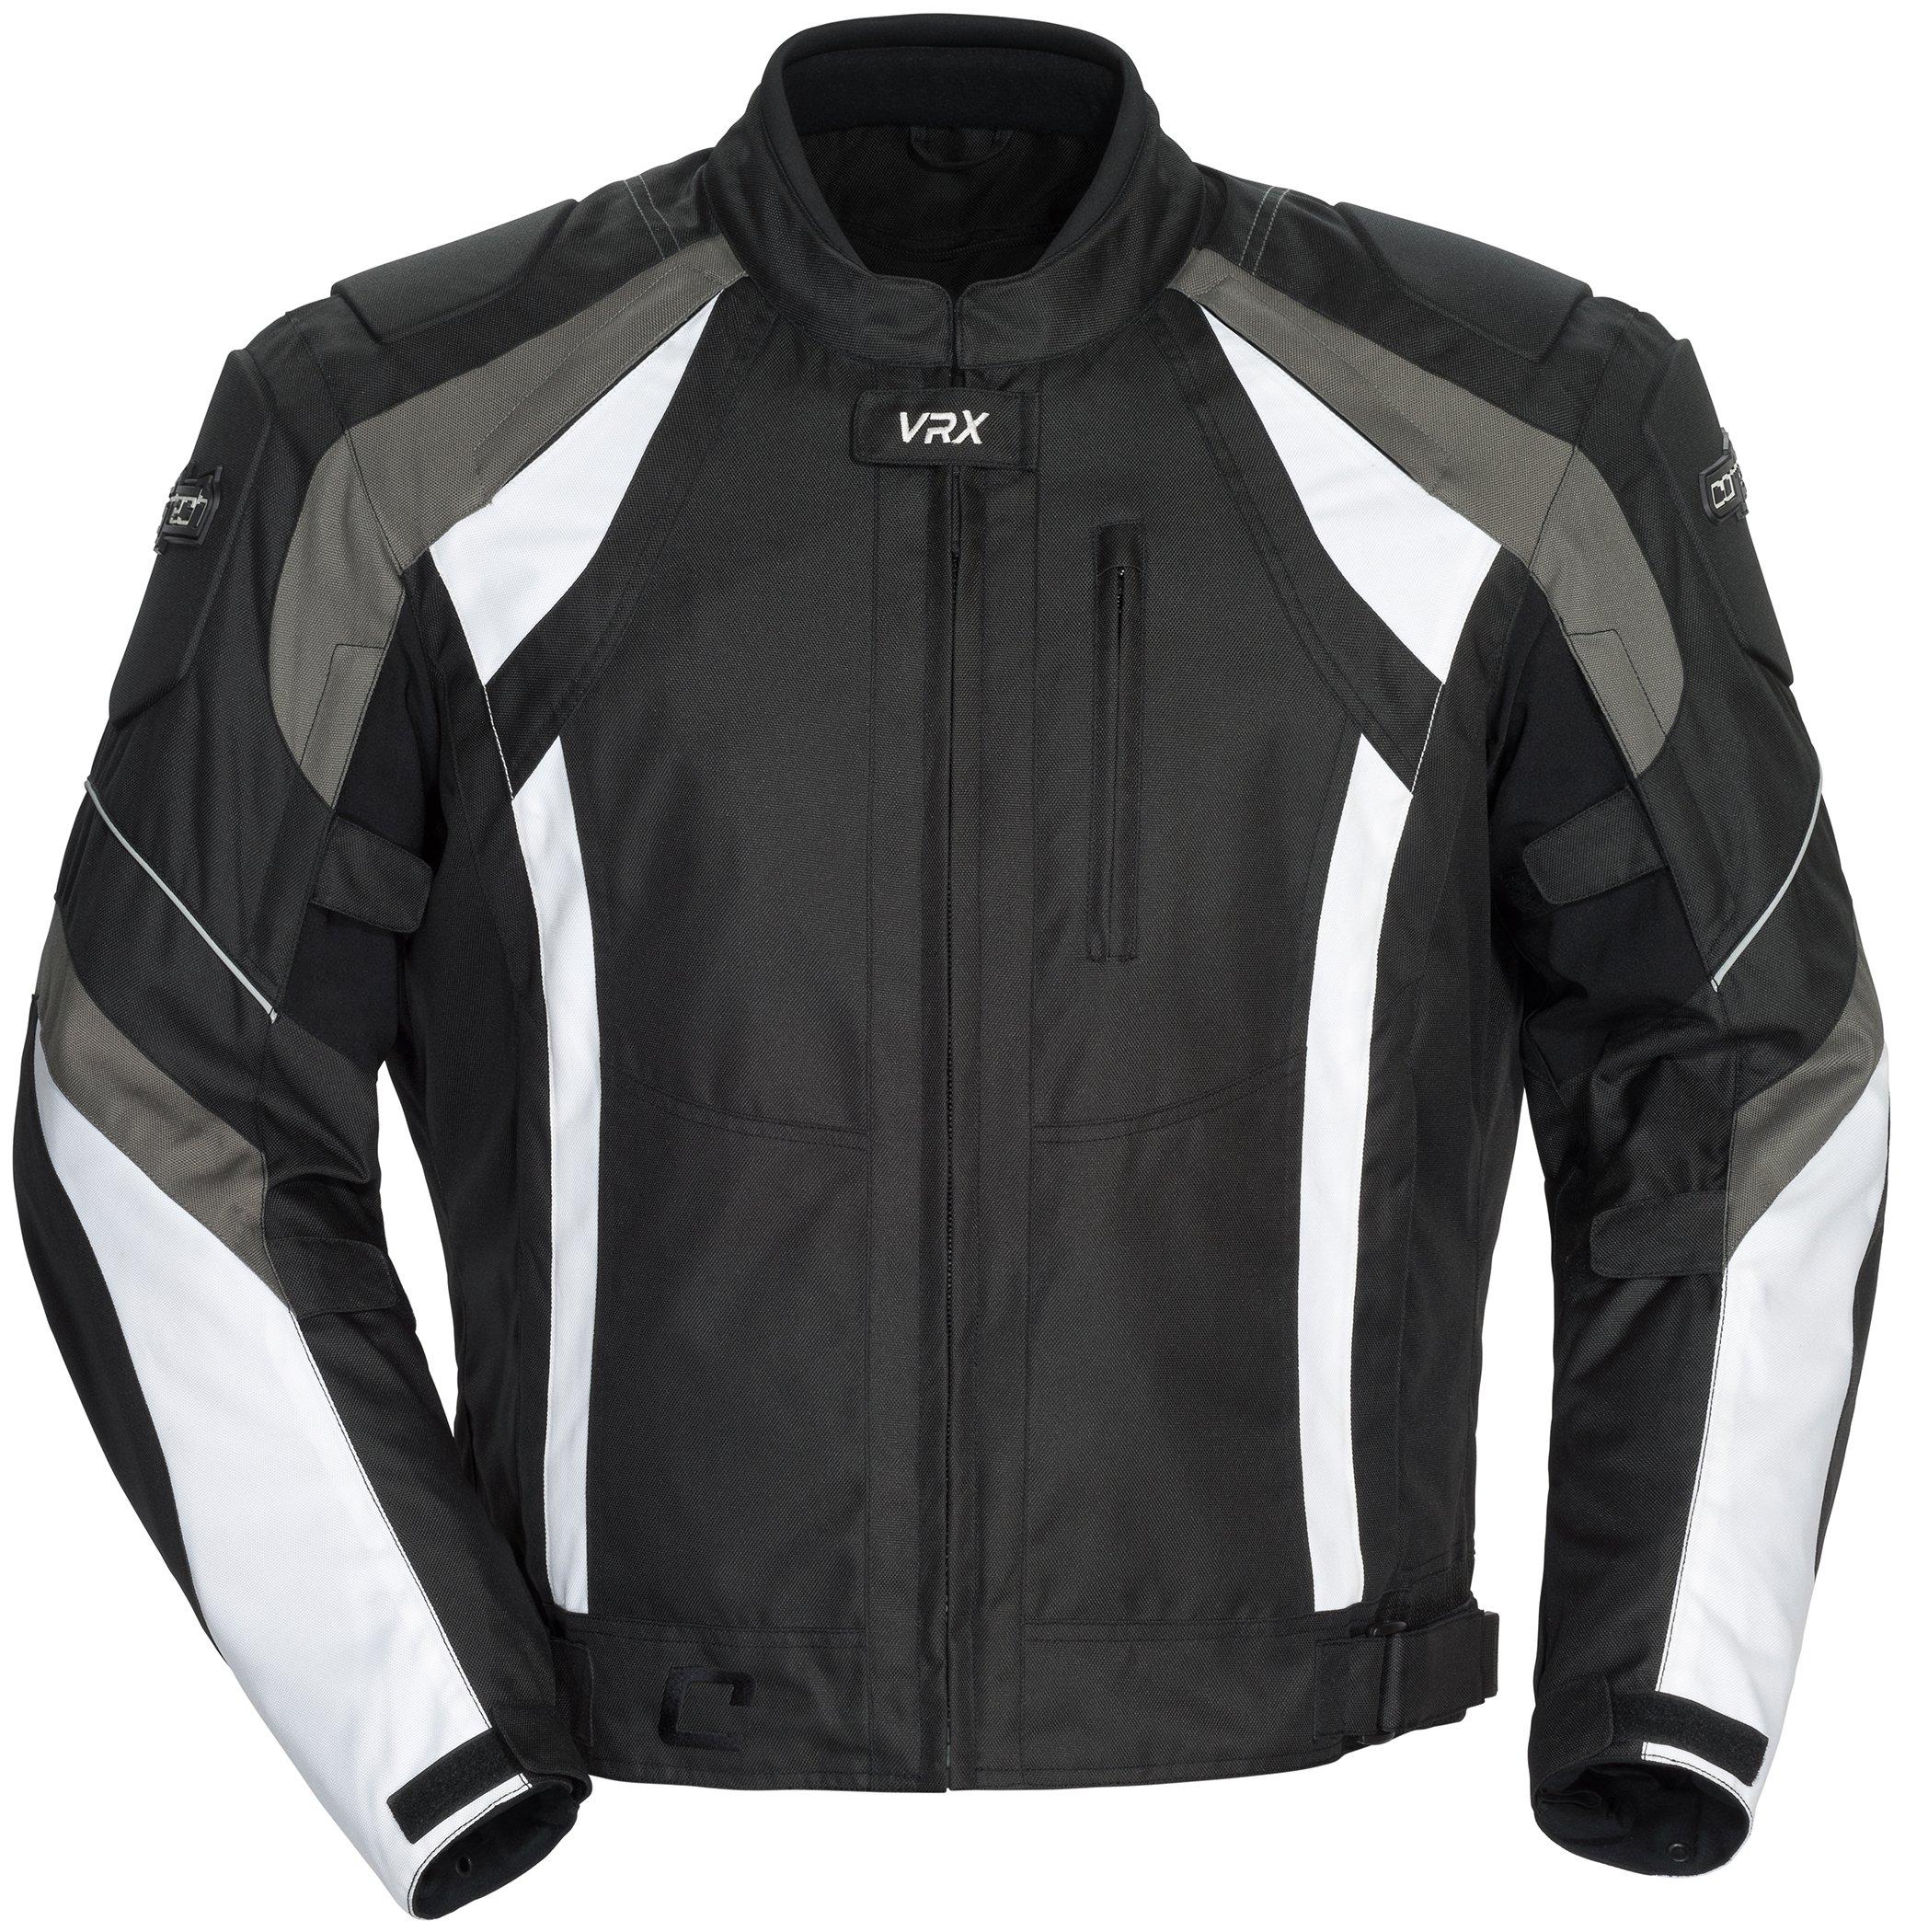 Cortech VRX Men's Textile Armored Motorcycle Jacket (Black/Gun/White, Medium)